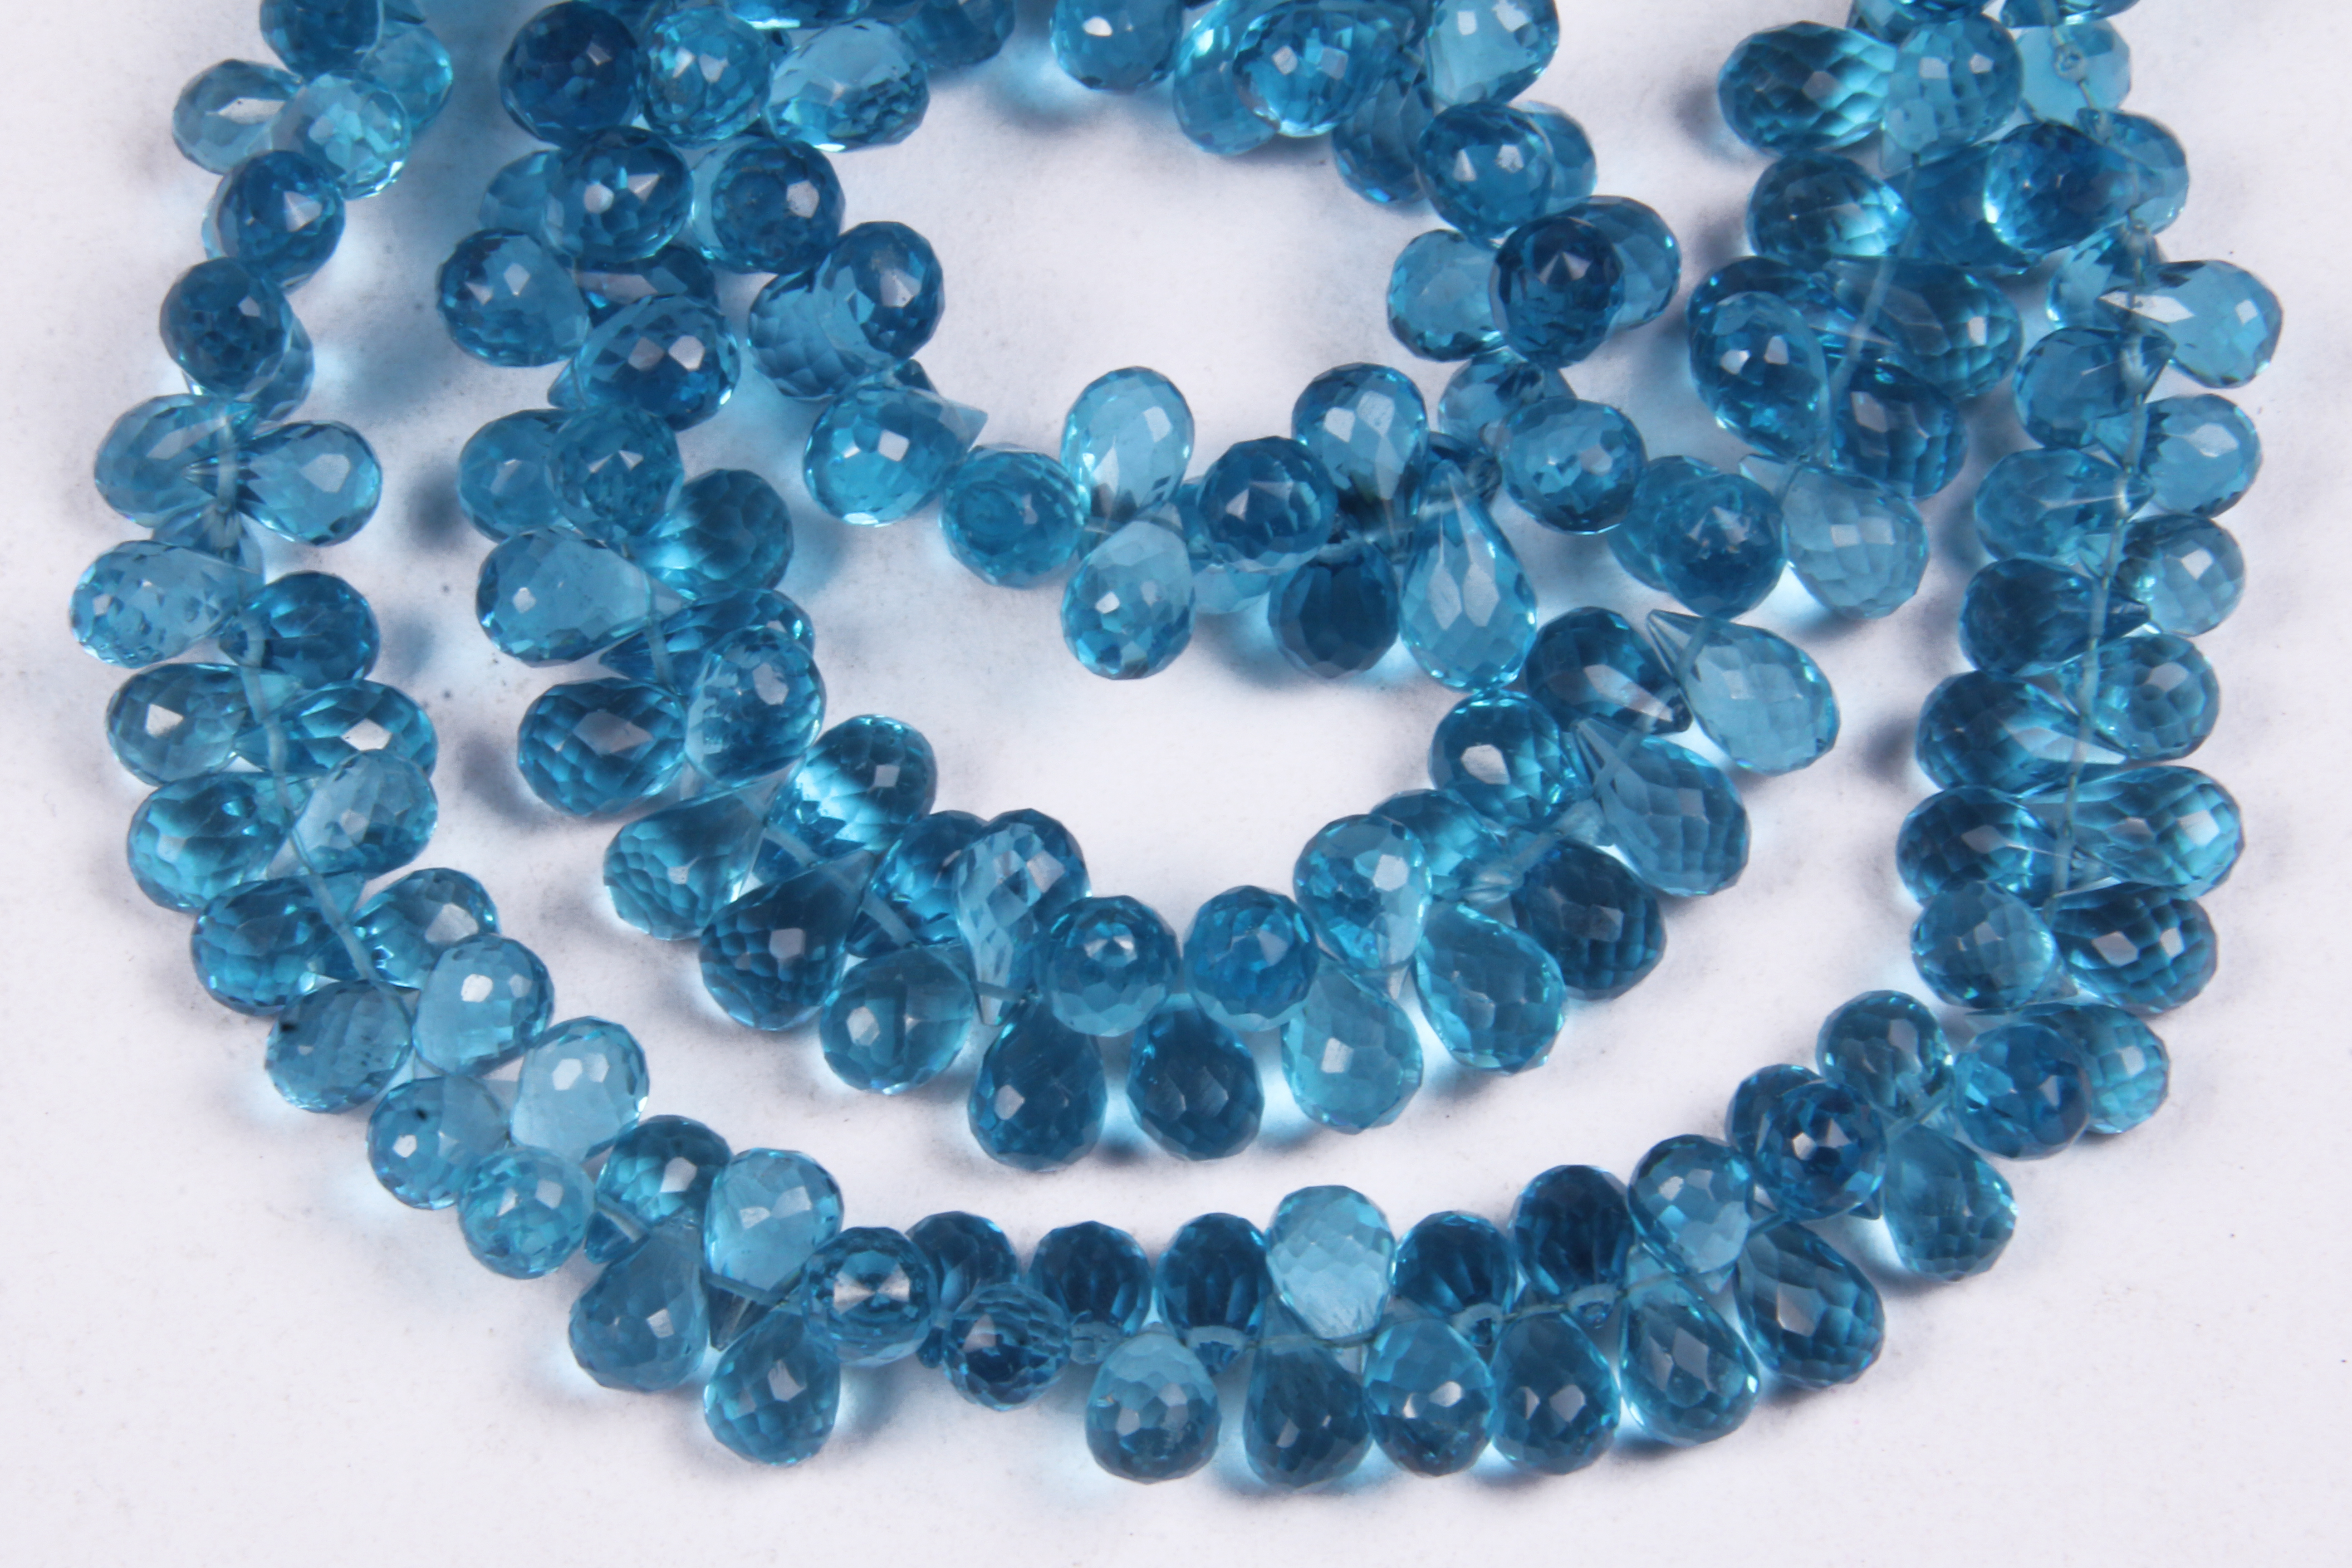 Blue Hydro Drops Beads